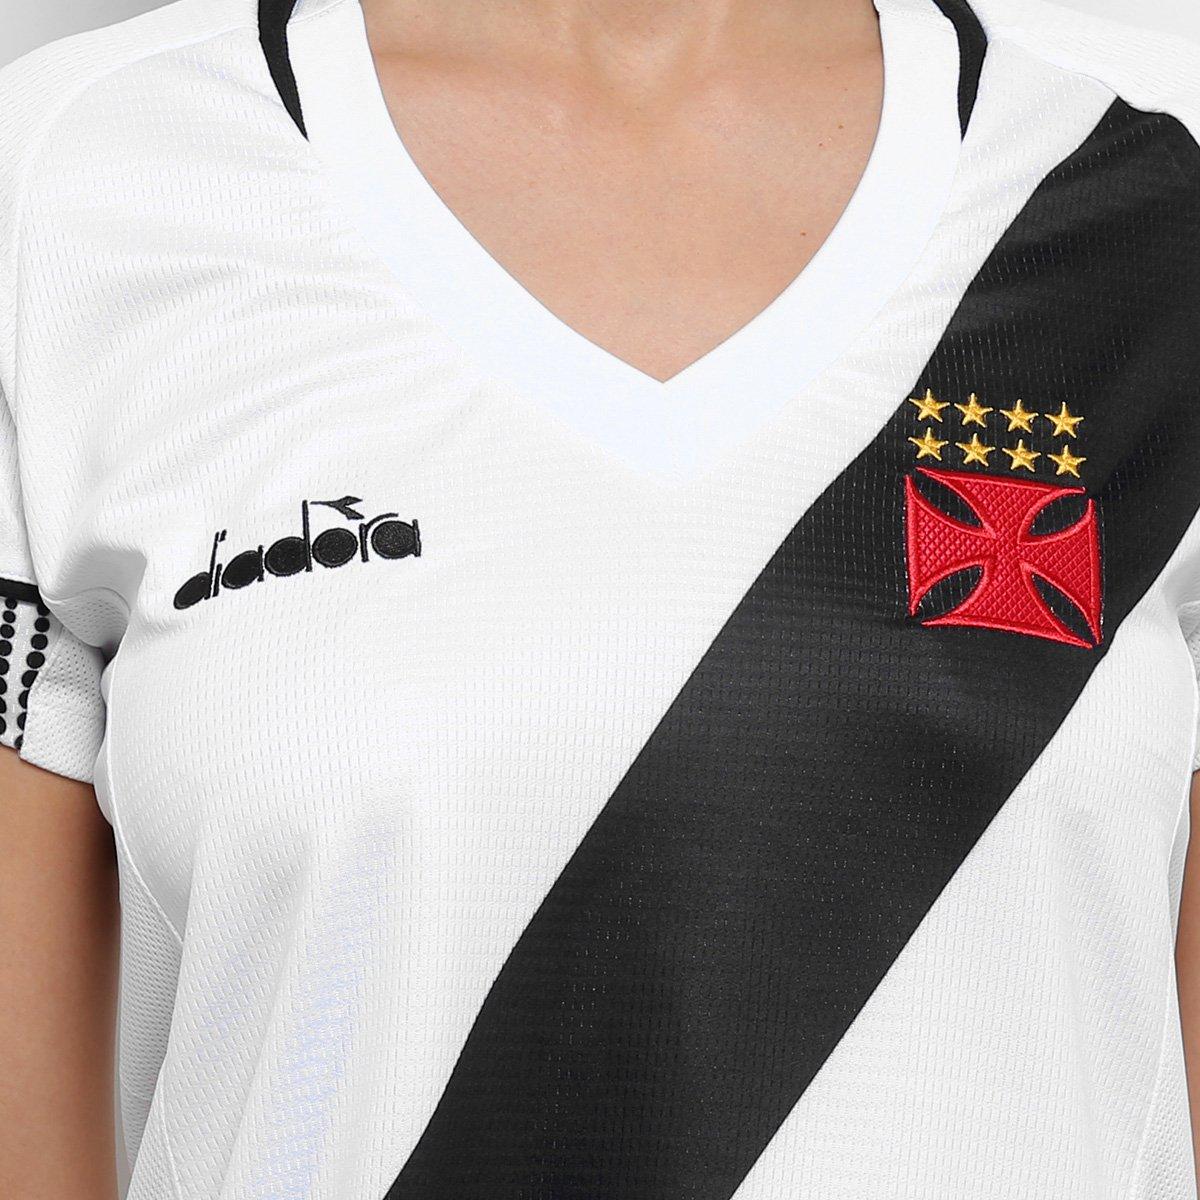 Camisa Vasco II 2018 s n° Torcedor Diadora Feminina - Branco ... 7a745e21fbd70